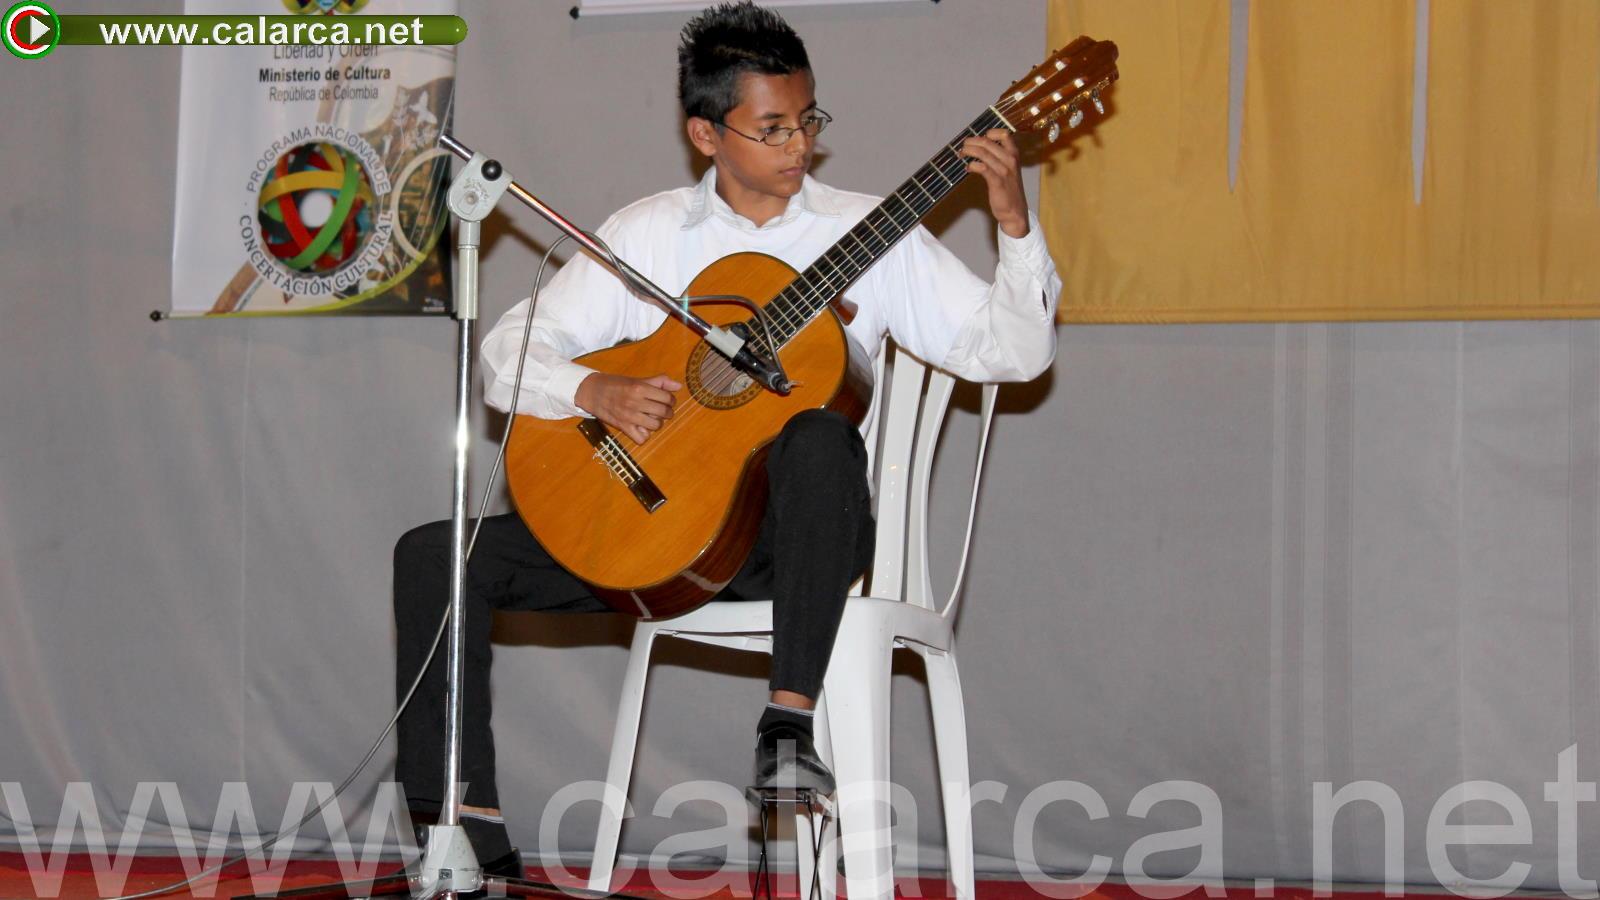 Solista guitarra - Juan José Marín Grisales